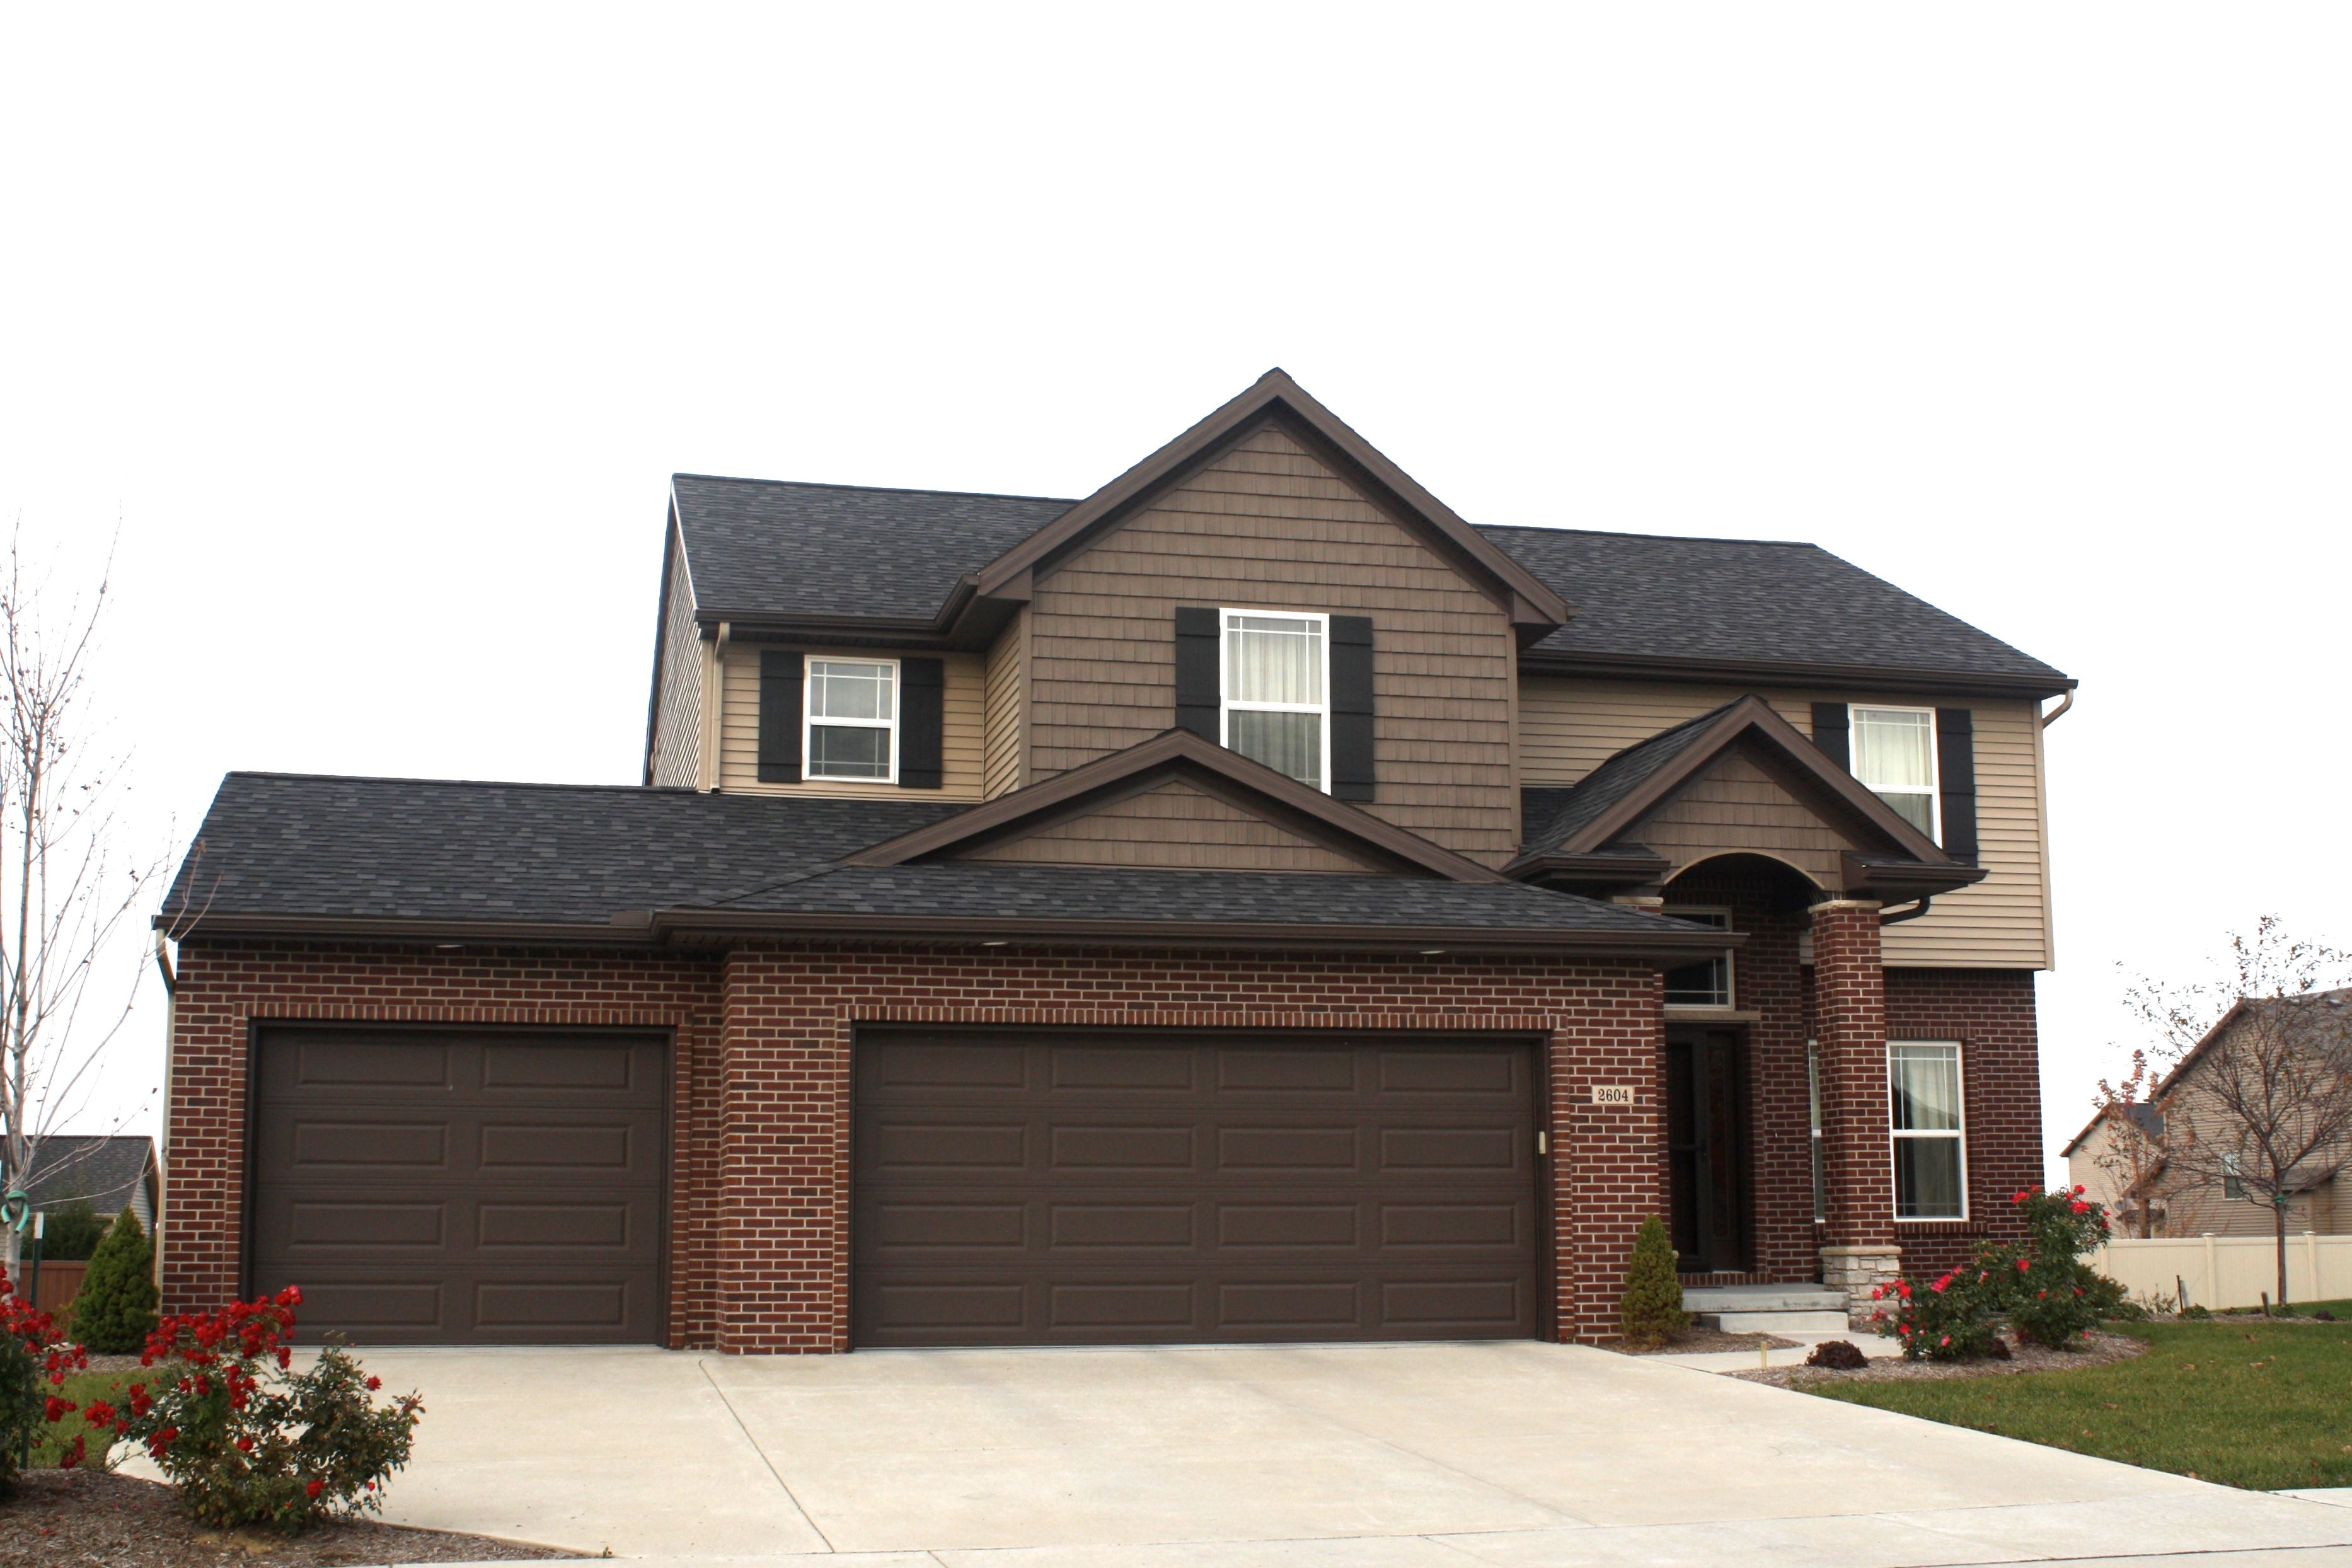 Best Black Roof Certainteed Sable Brown Shakes Mastic 400 x 300